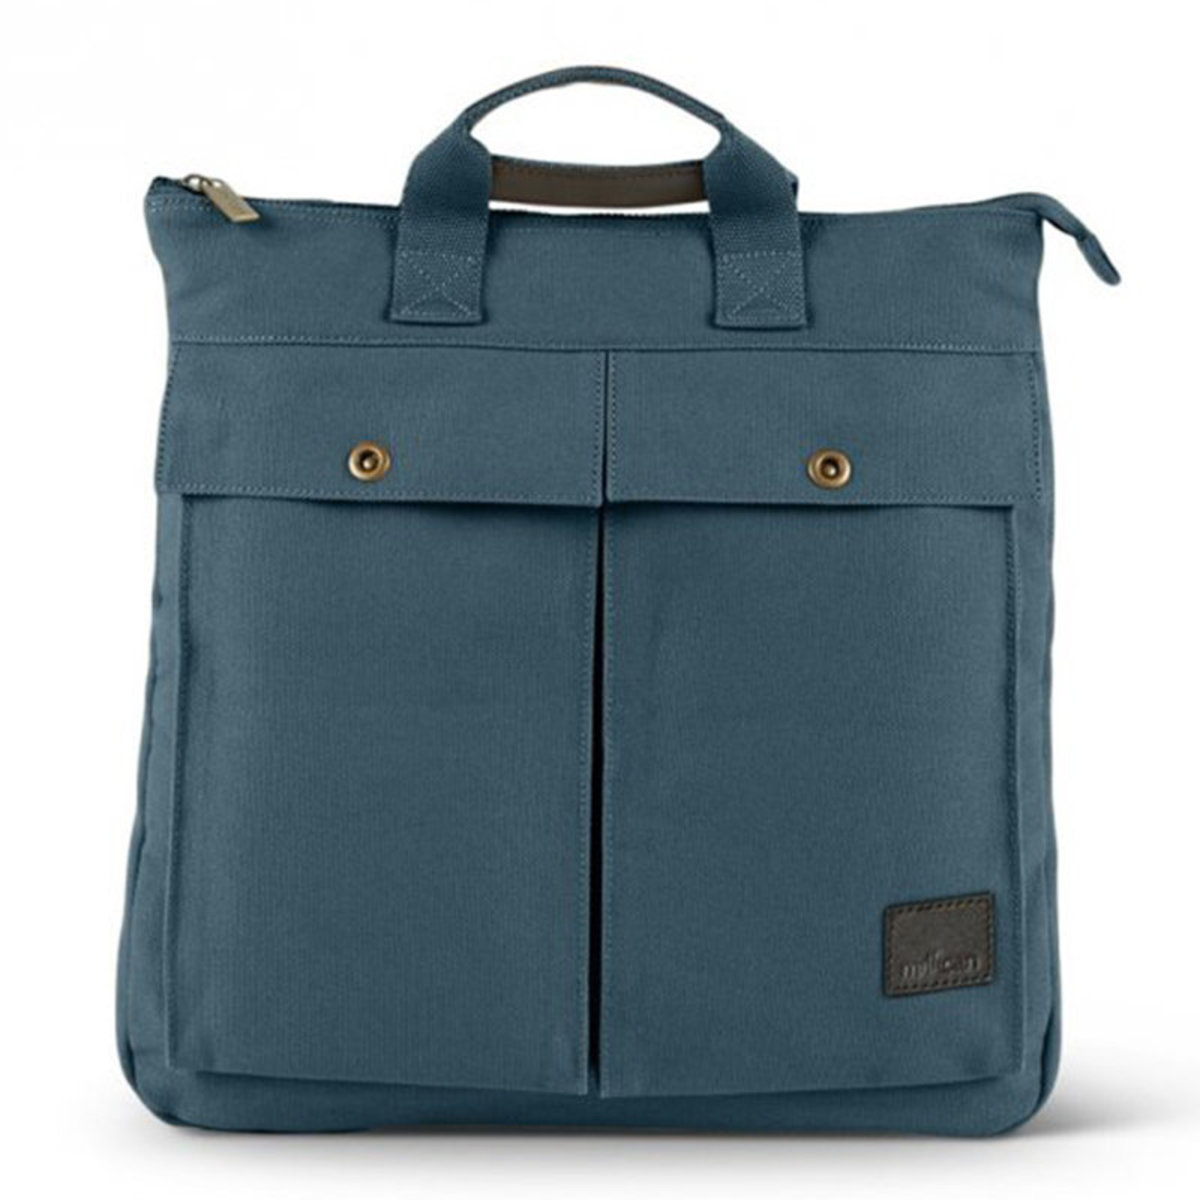 斜揹/手提袋 - George The Crew Bag (13L)